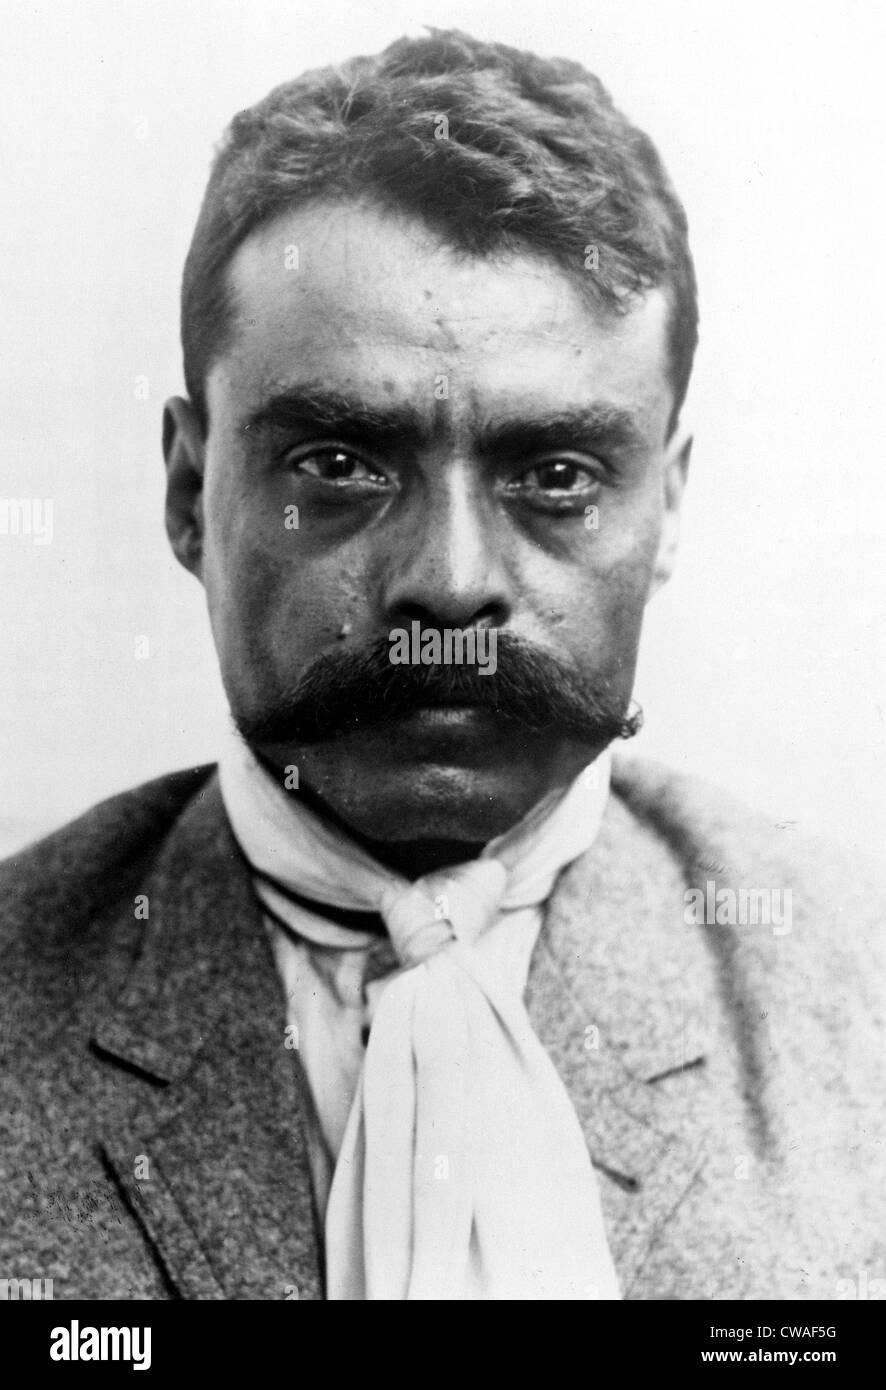 Watch Mexican Mustache video